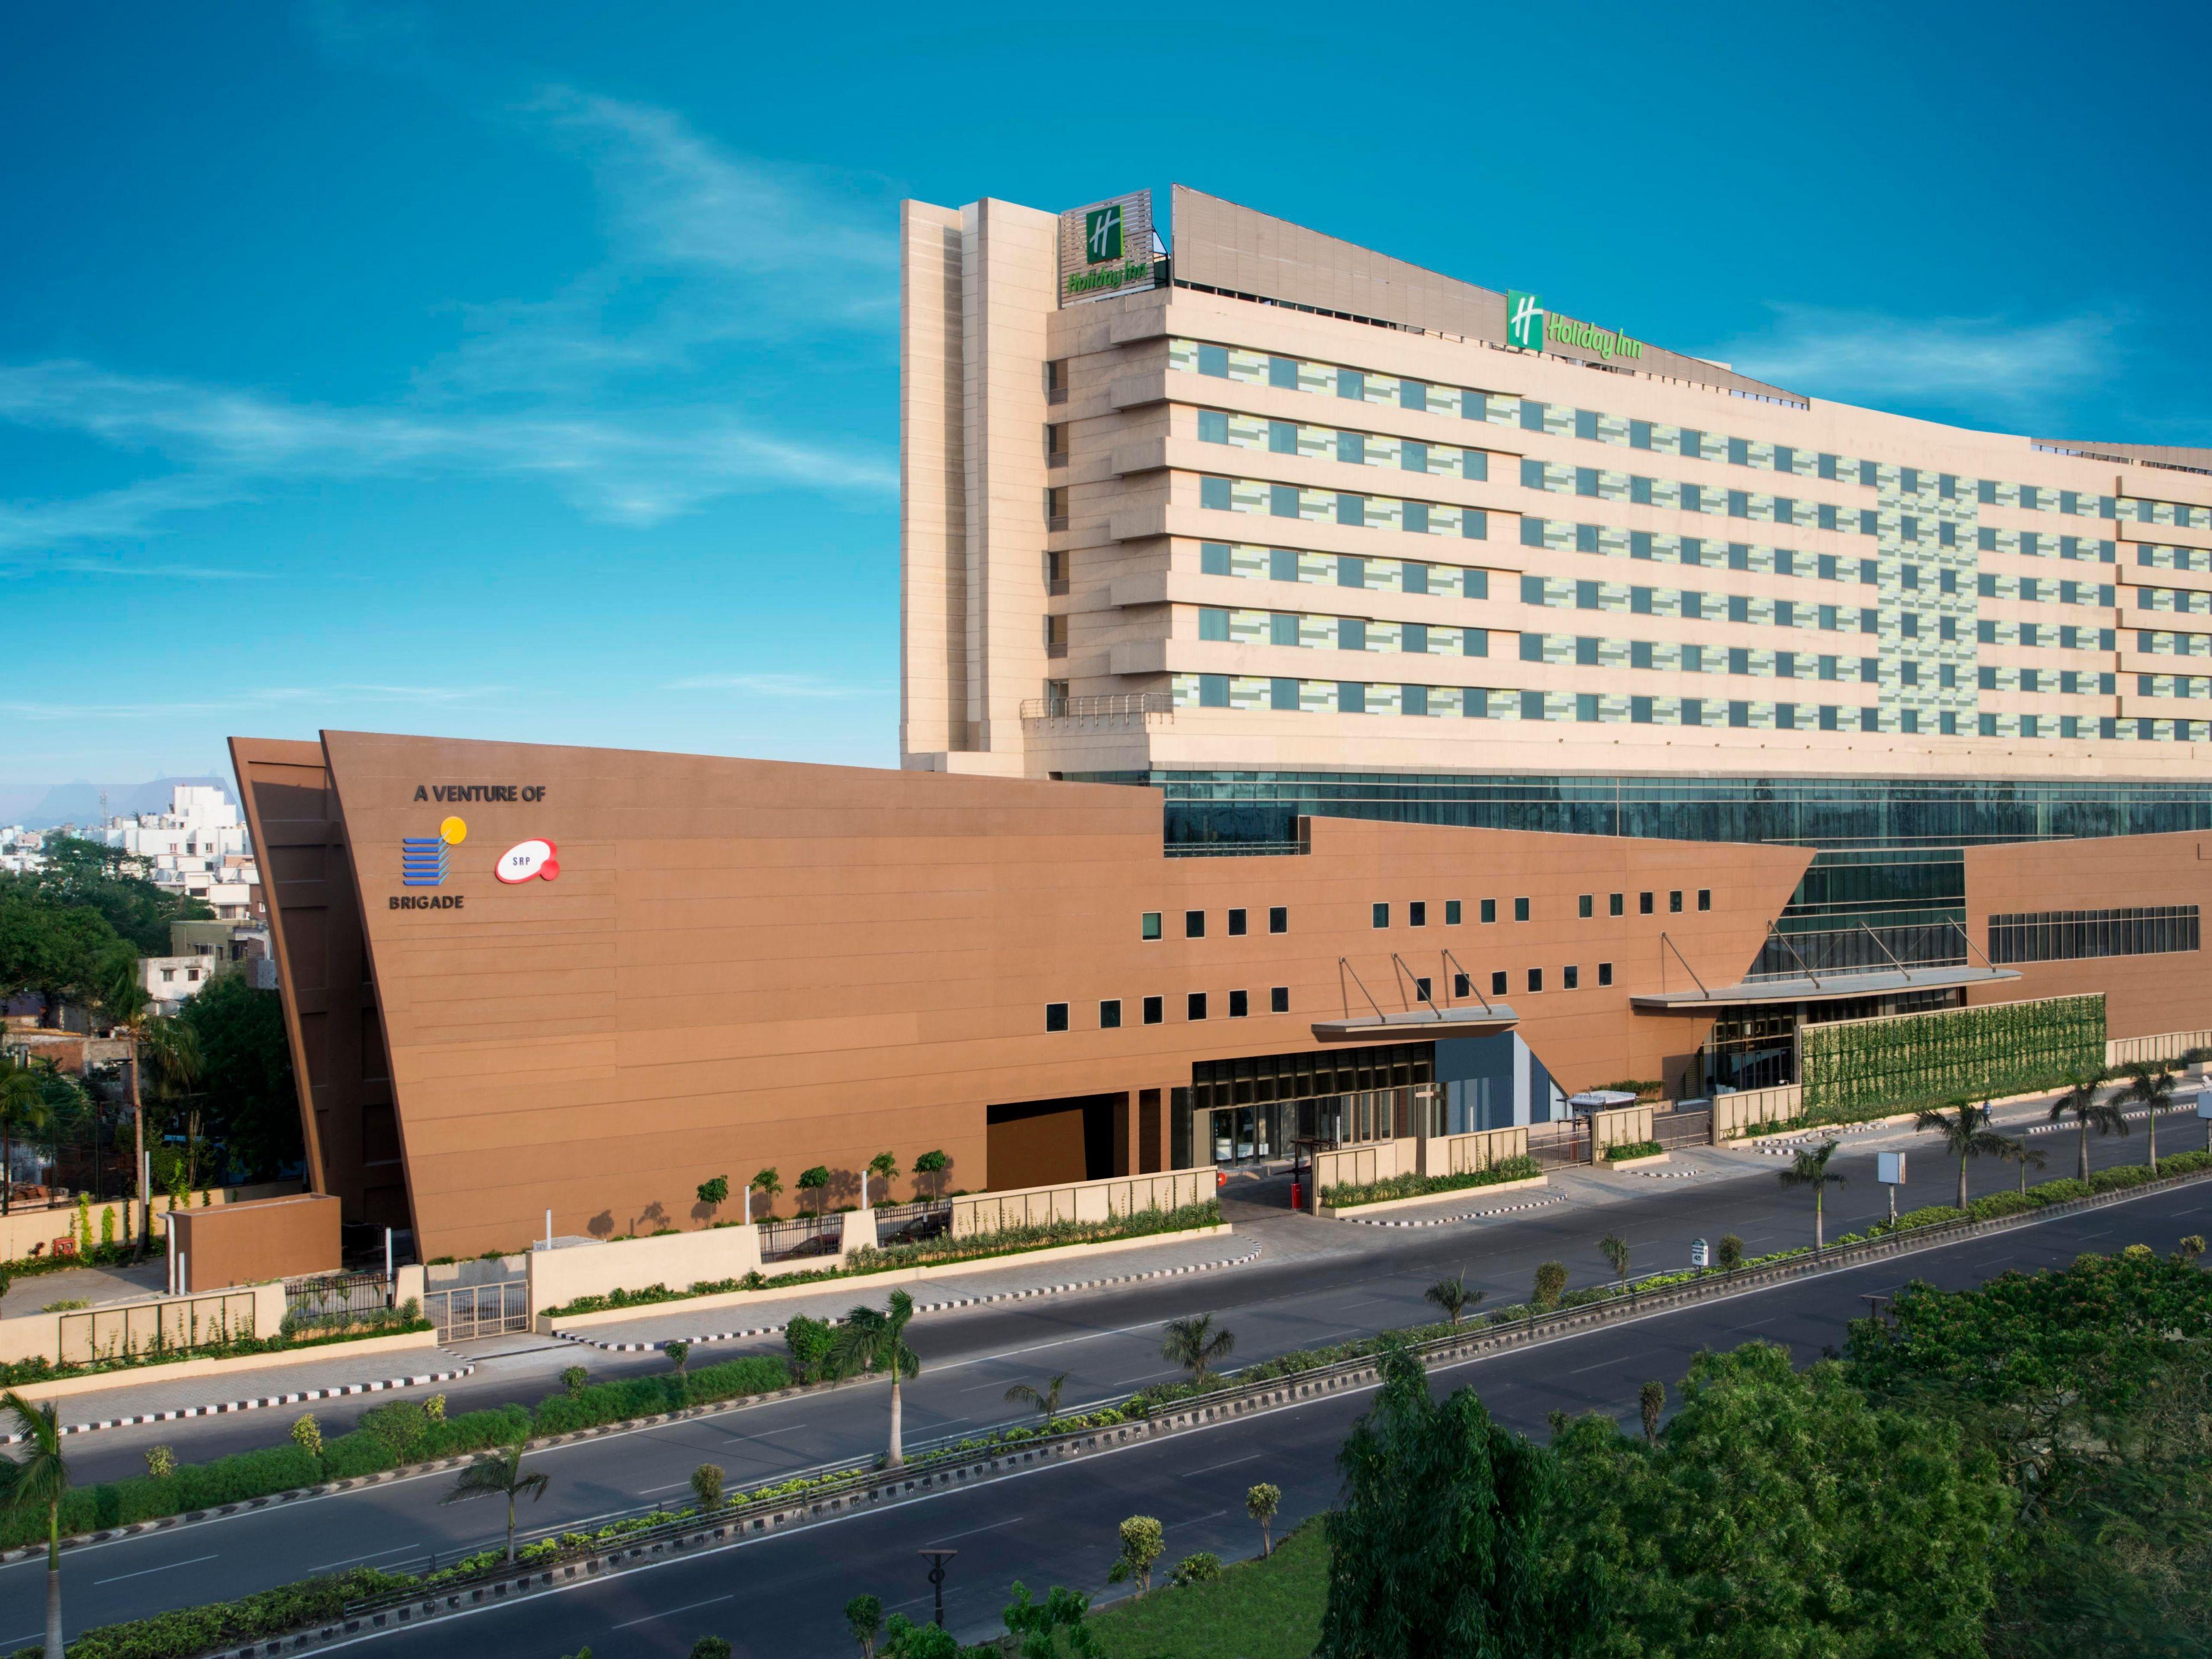 Holiday inn chennai omr it expressway hotel by ihg solutioingenieria Choice Image